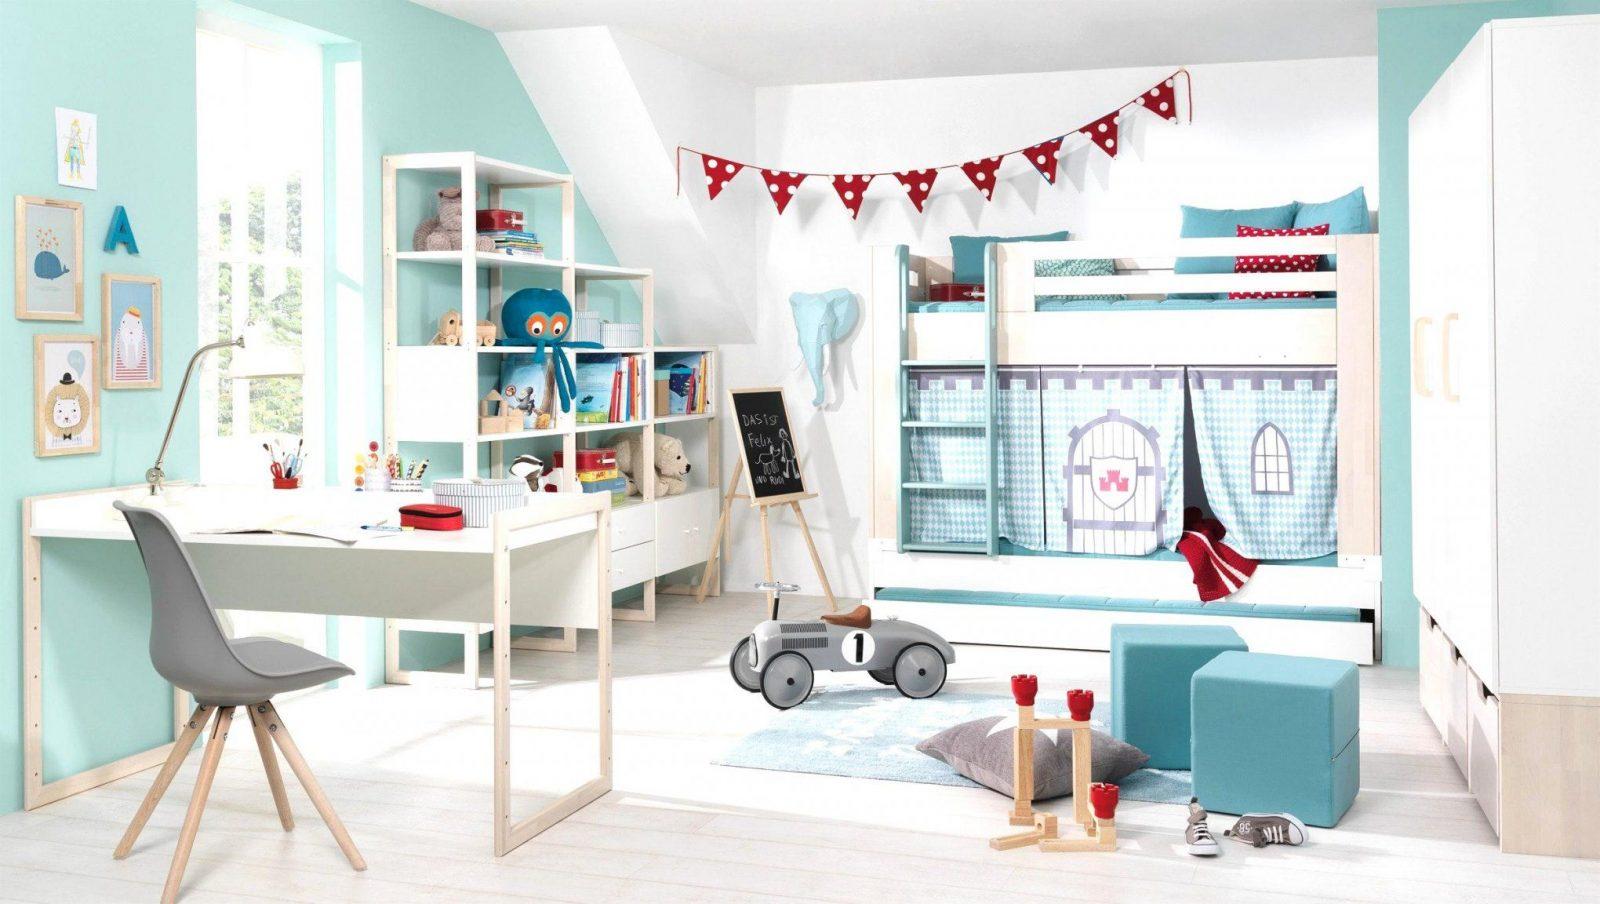 Kinderzimmertapete Jungs Elegant Beeindruckende Ideen Kinderzimmer von Kinderzimmer Für Jungs Gestalten Photo